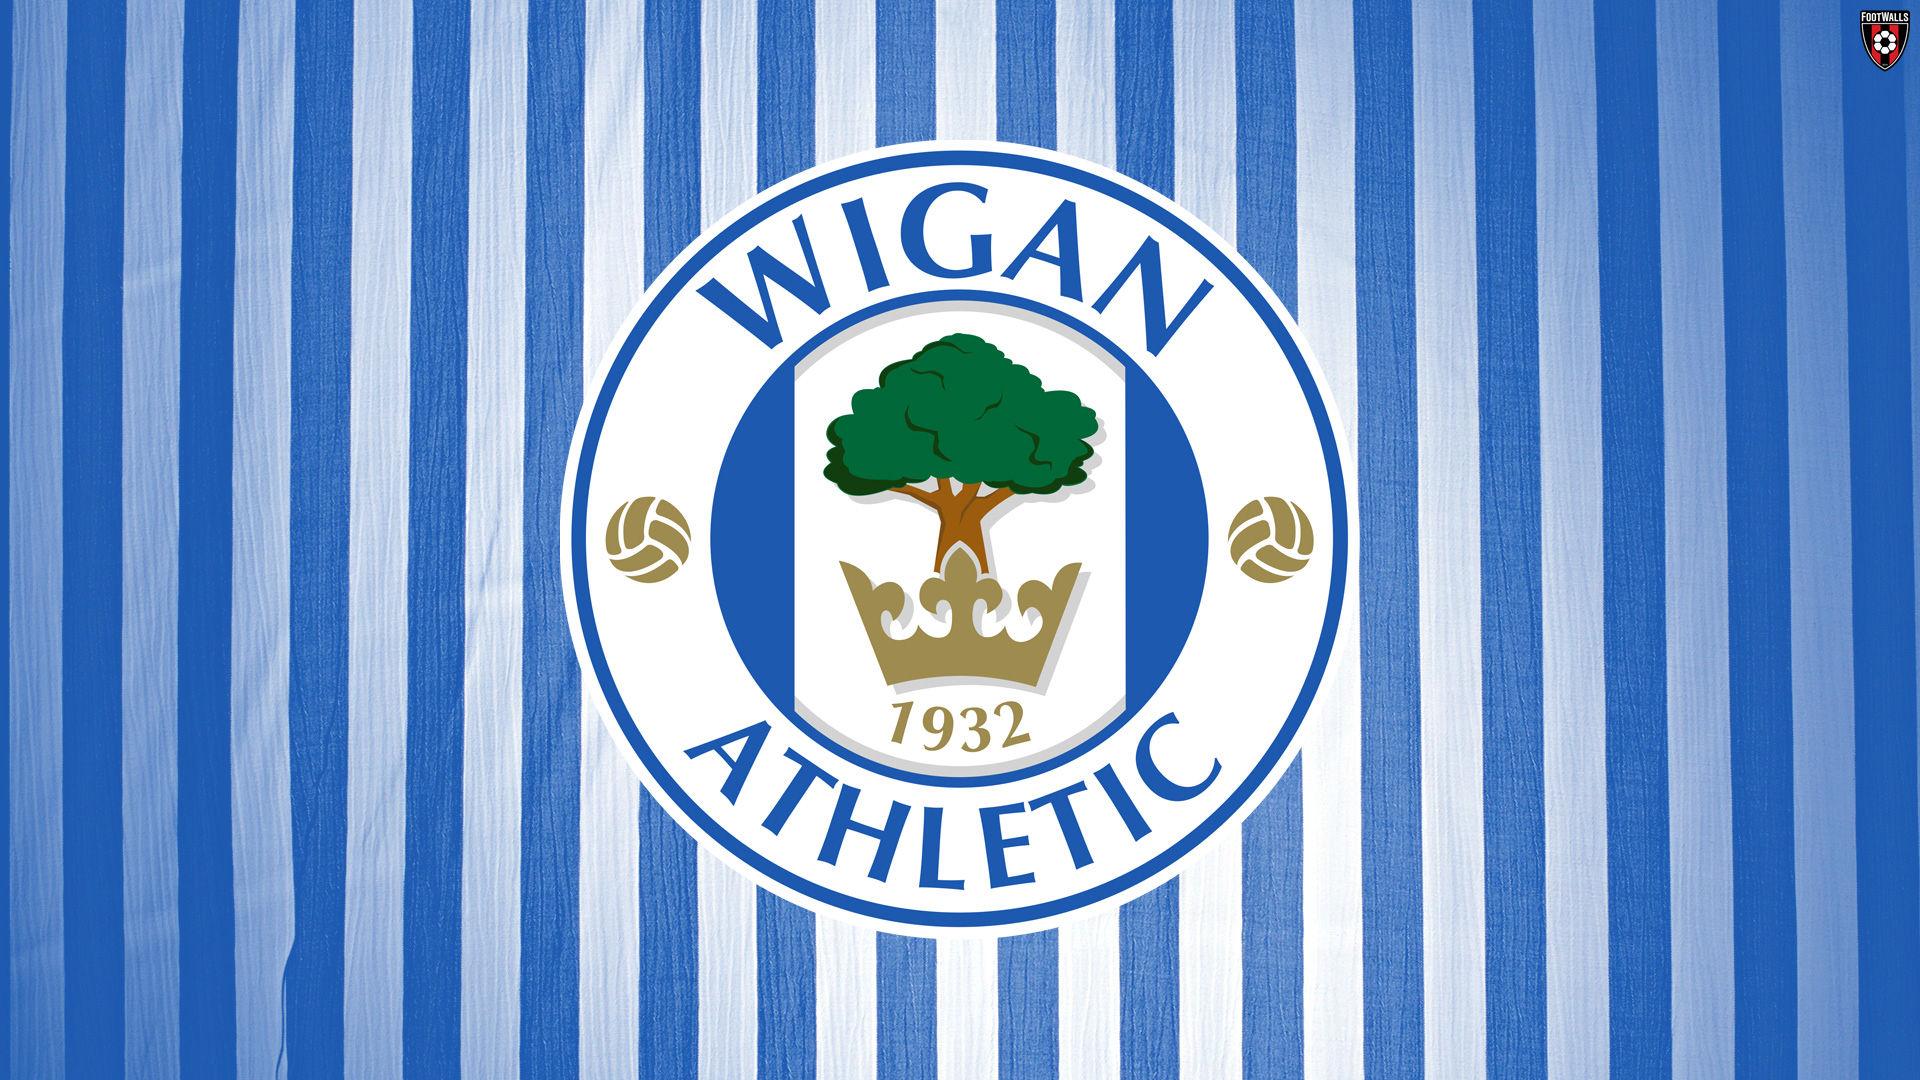 Ronaldo Hd Wallpapers Football Wigan Athletic Wallpapers Clubs Football Wallpapers